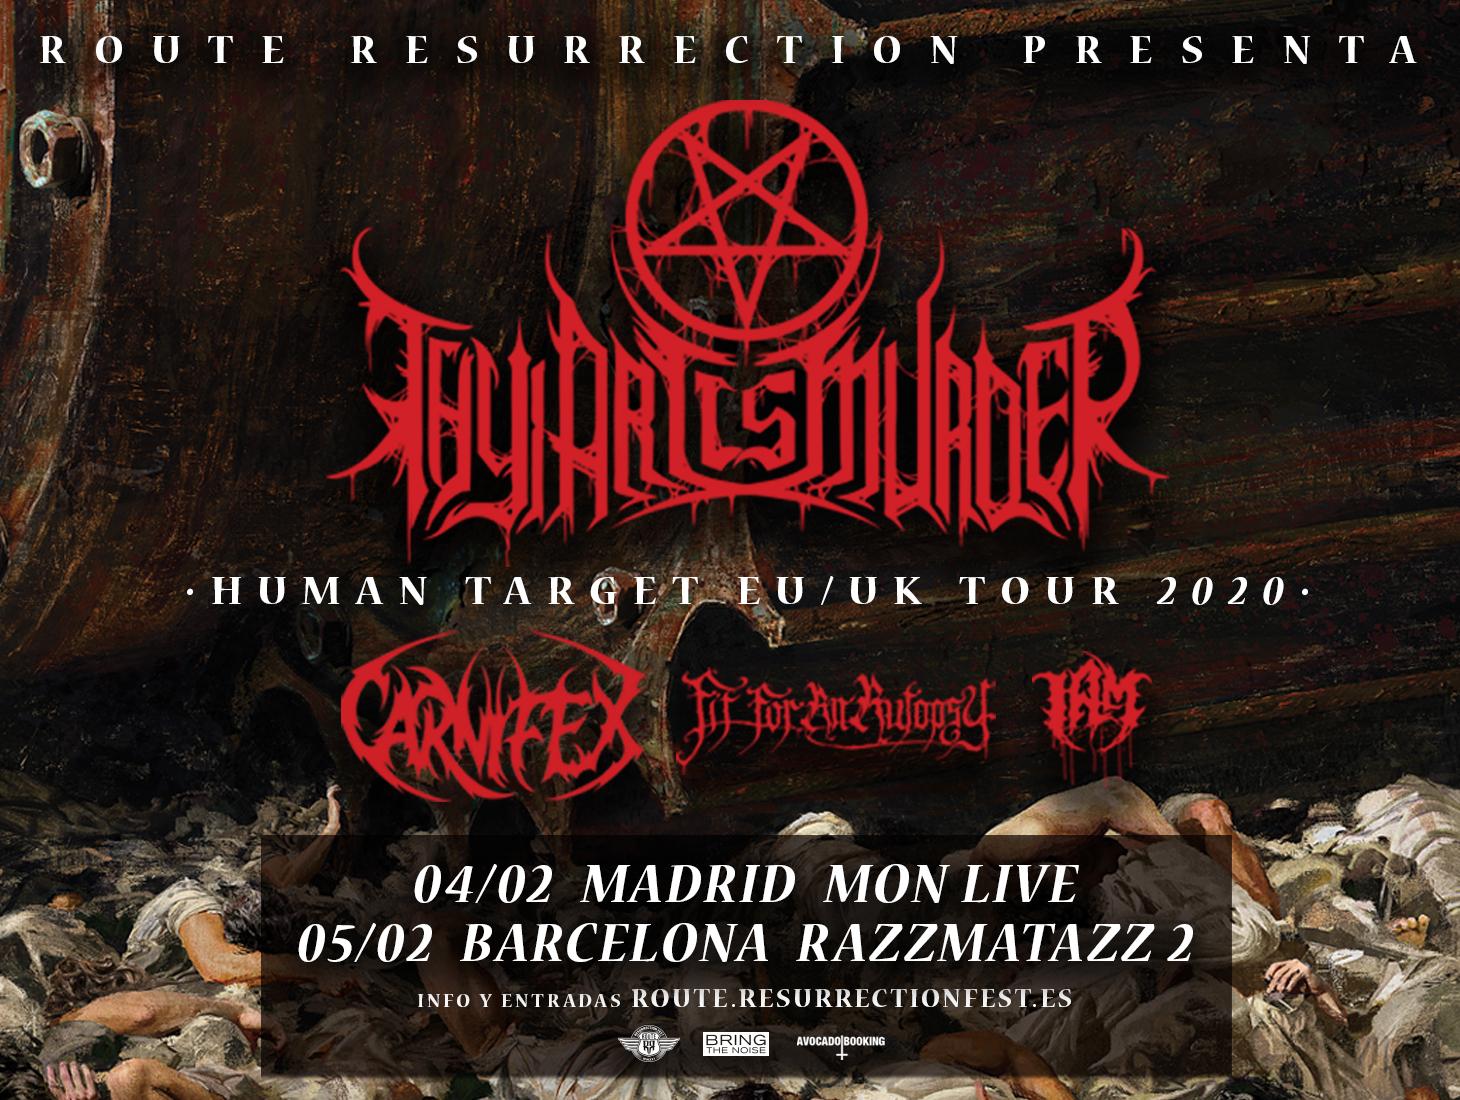 thy-art-is-murder-barcelona-2020-5d53b81